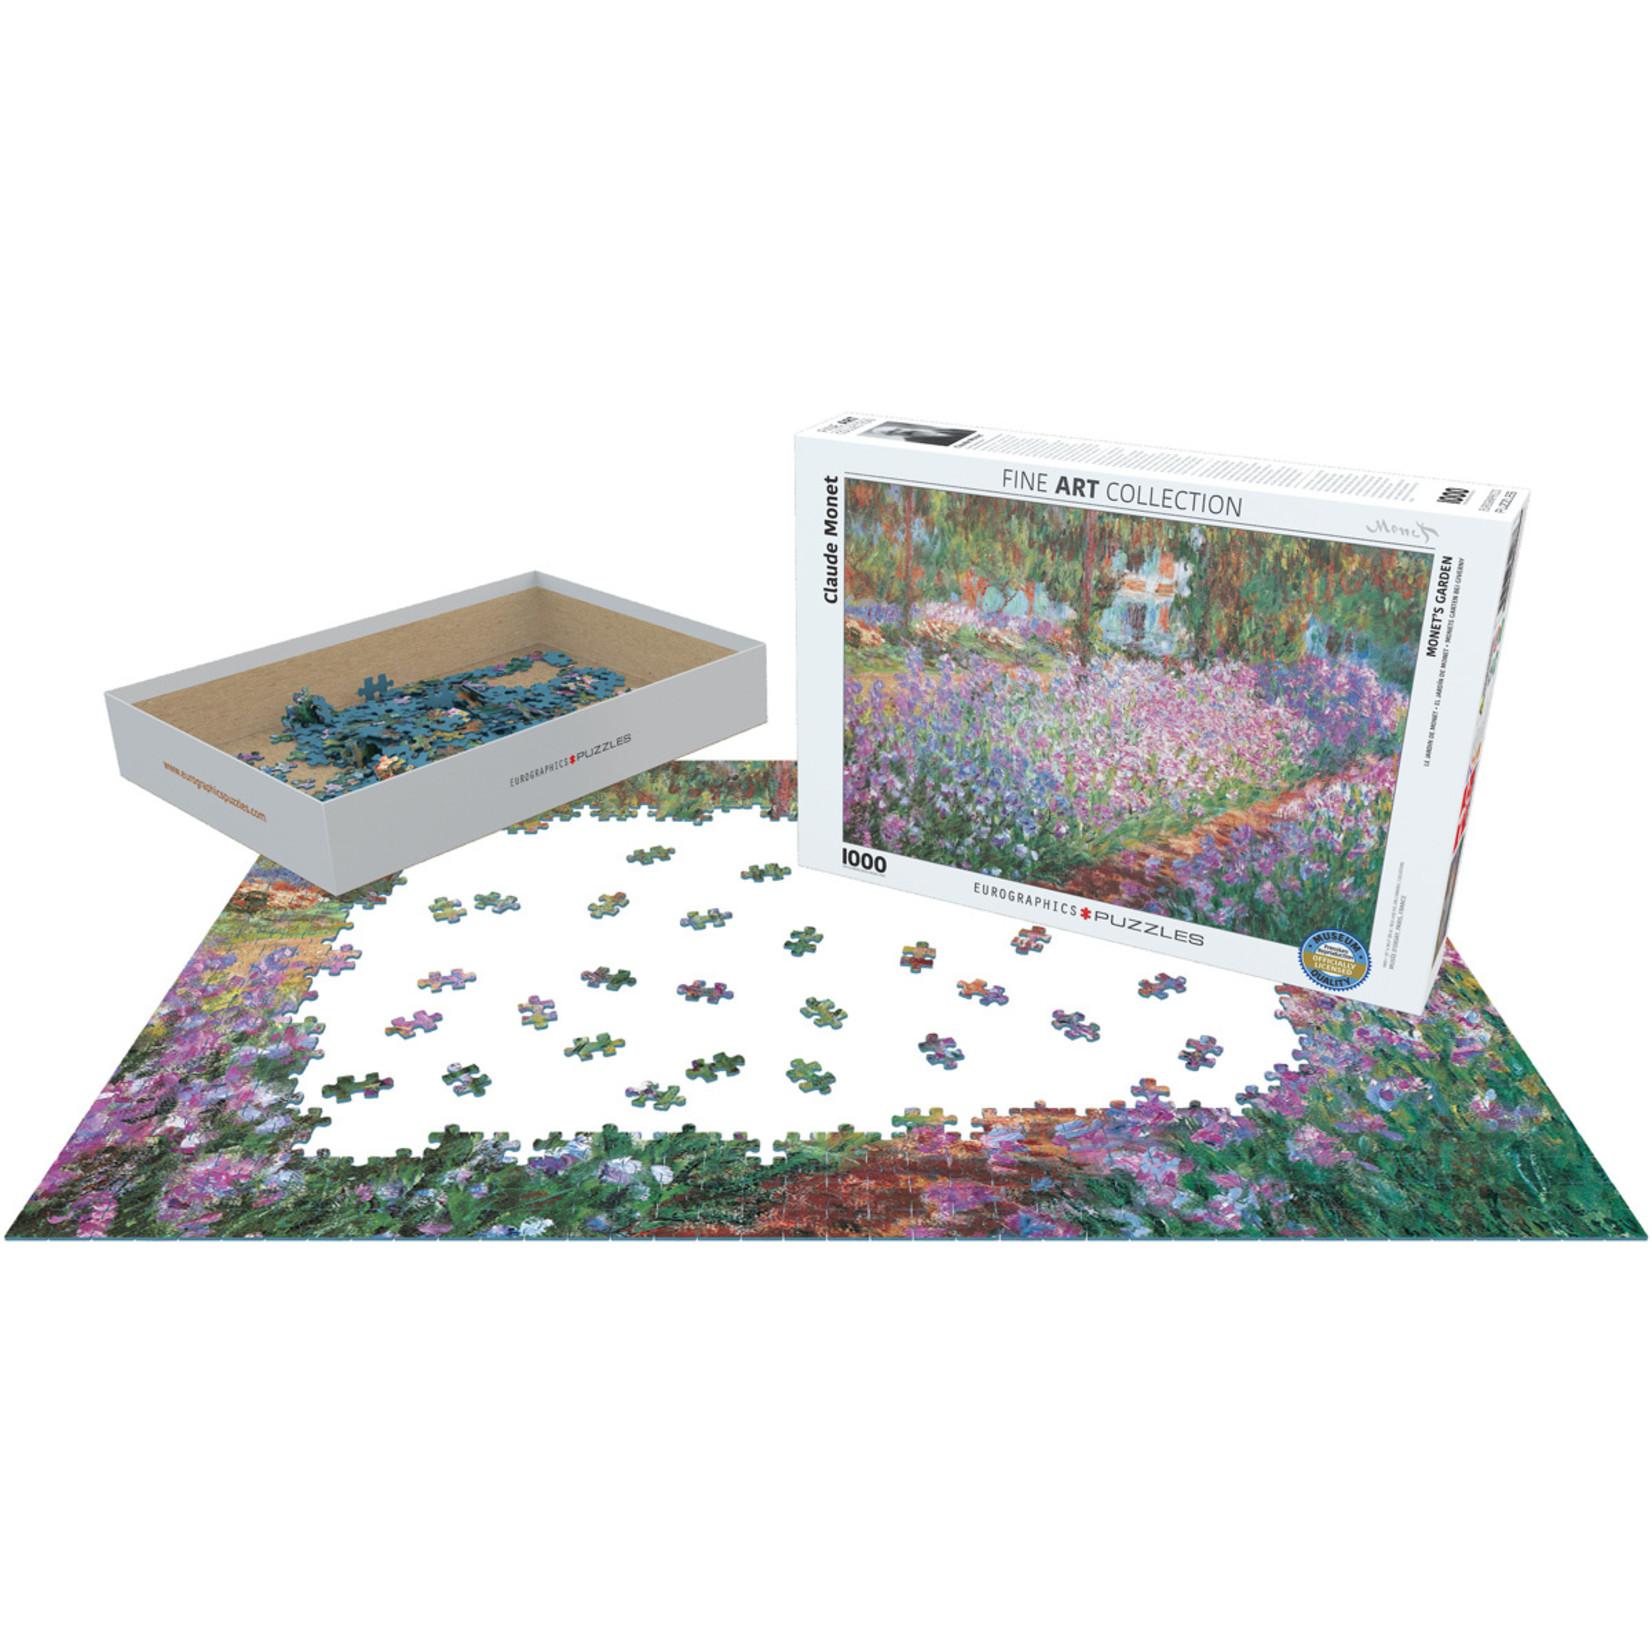 EuroGraphics Puzzles Monet's Garden 1000 Pc